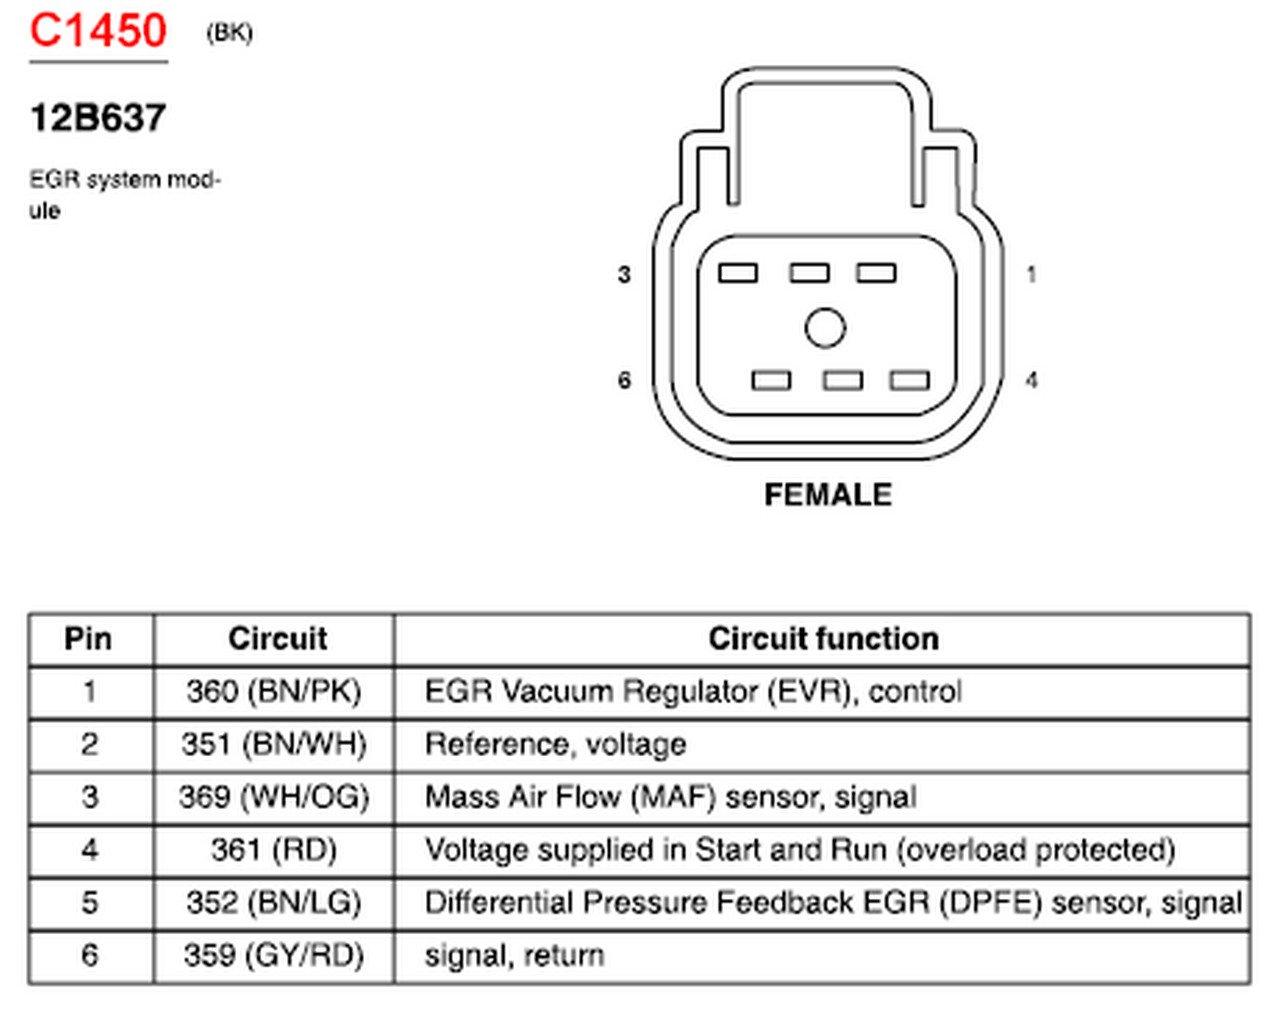 05 freestar. code p0401. egr valve, dpfe sensor and vacuum egr sensor ford aspire wiring diagram 97 ford aspire engine diagram